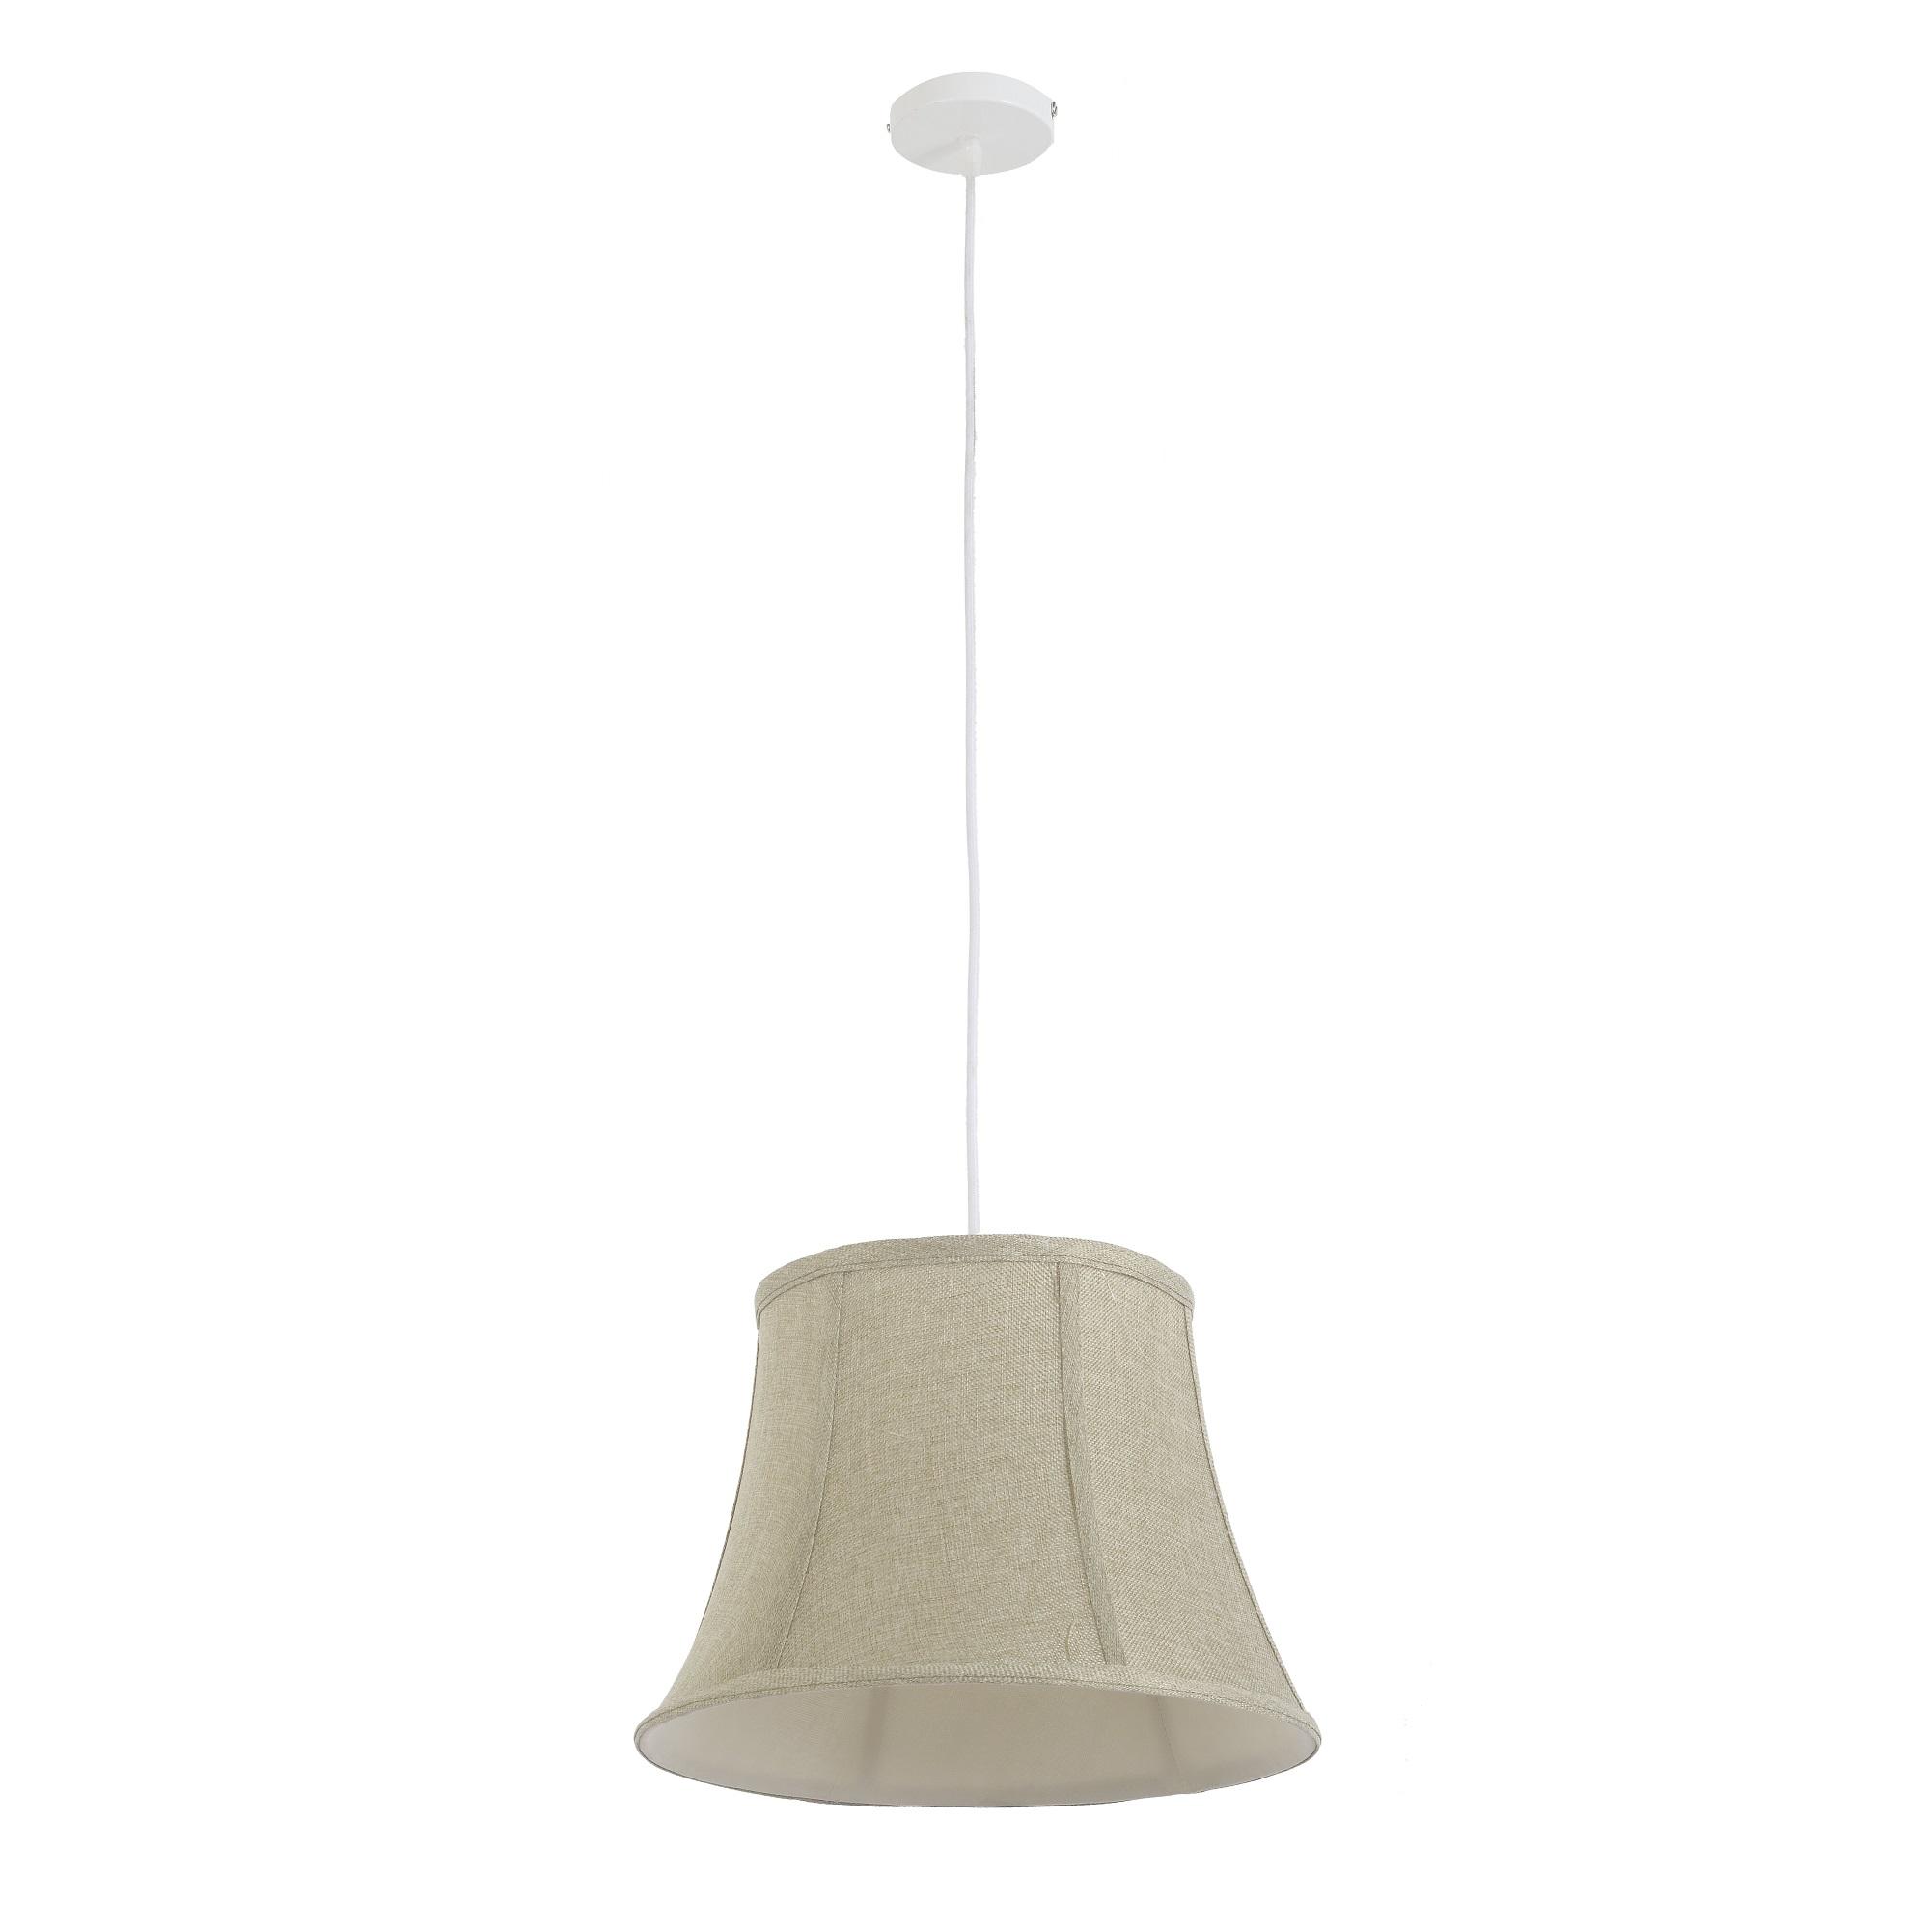 Фото - Подвесной светильник Arti Lampadari Cantare E 1.3.P2 BR подвесной светильник arti lampadari olio e 1 3 p1 br